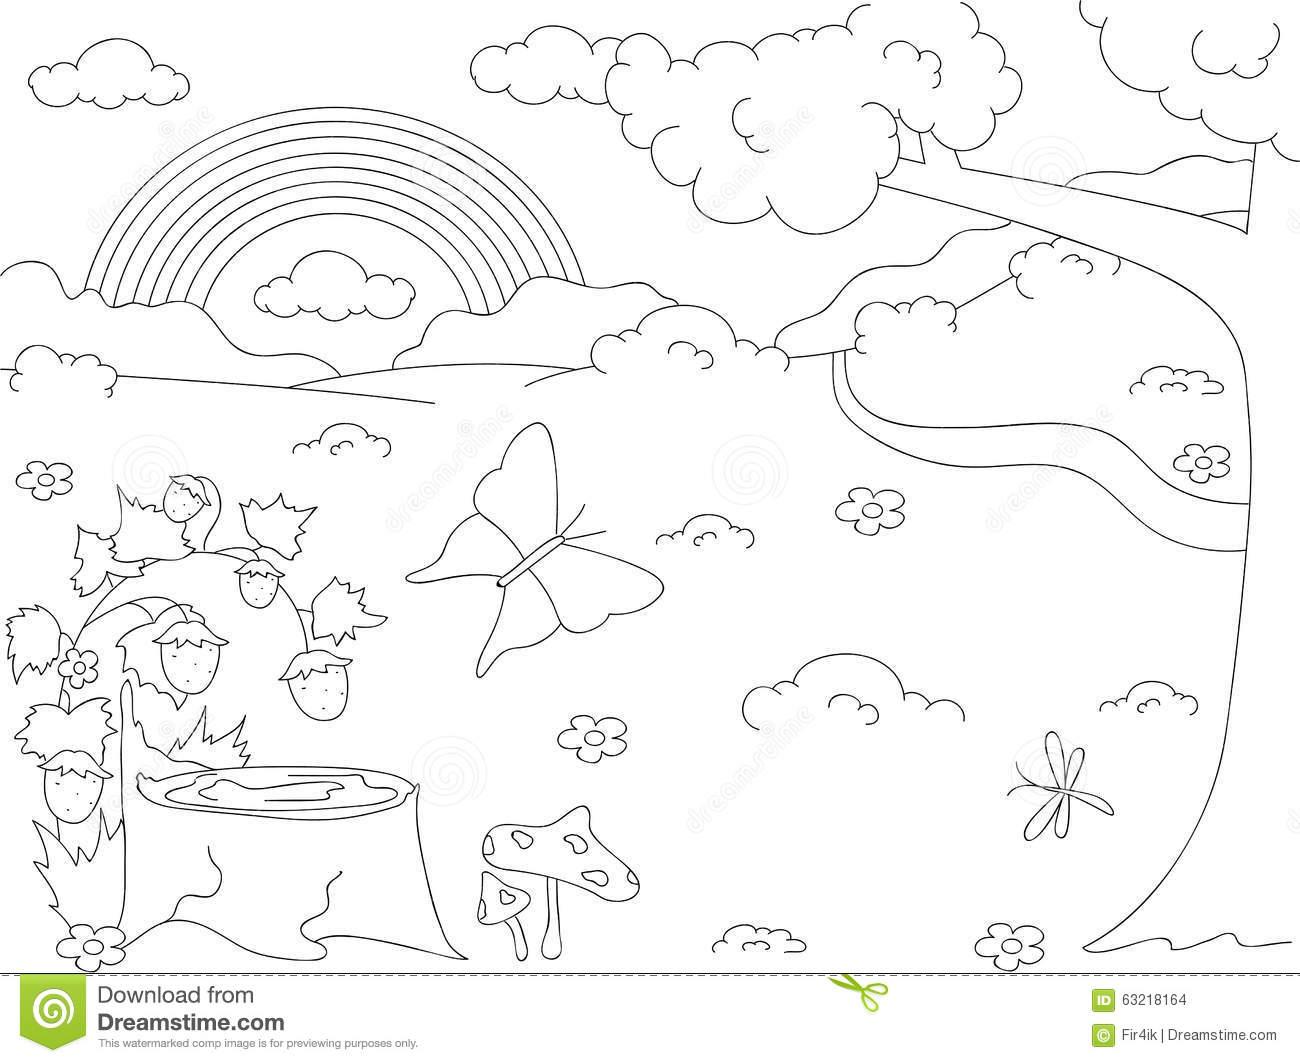 Stub coloring #16, Download drawings